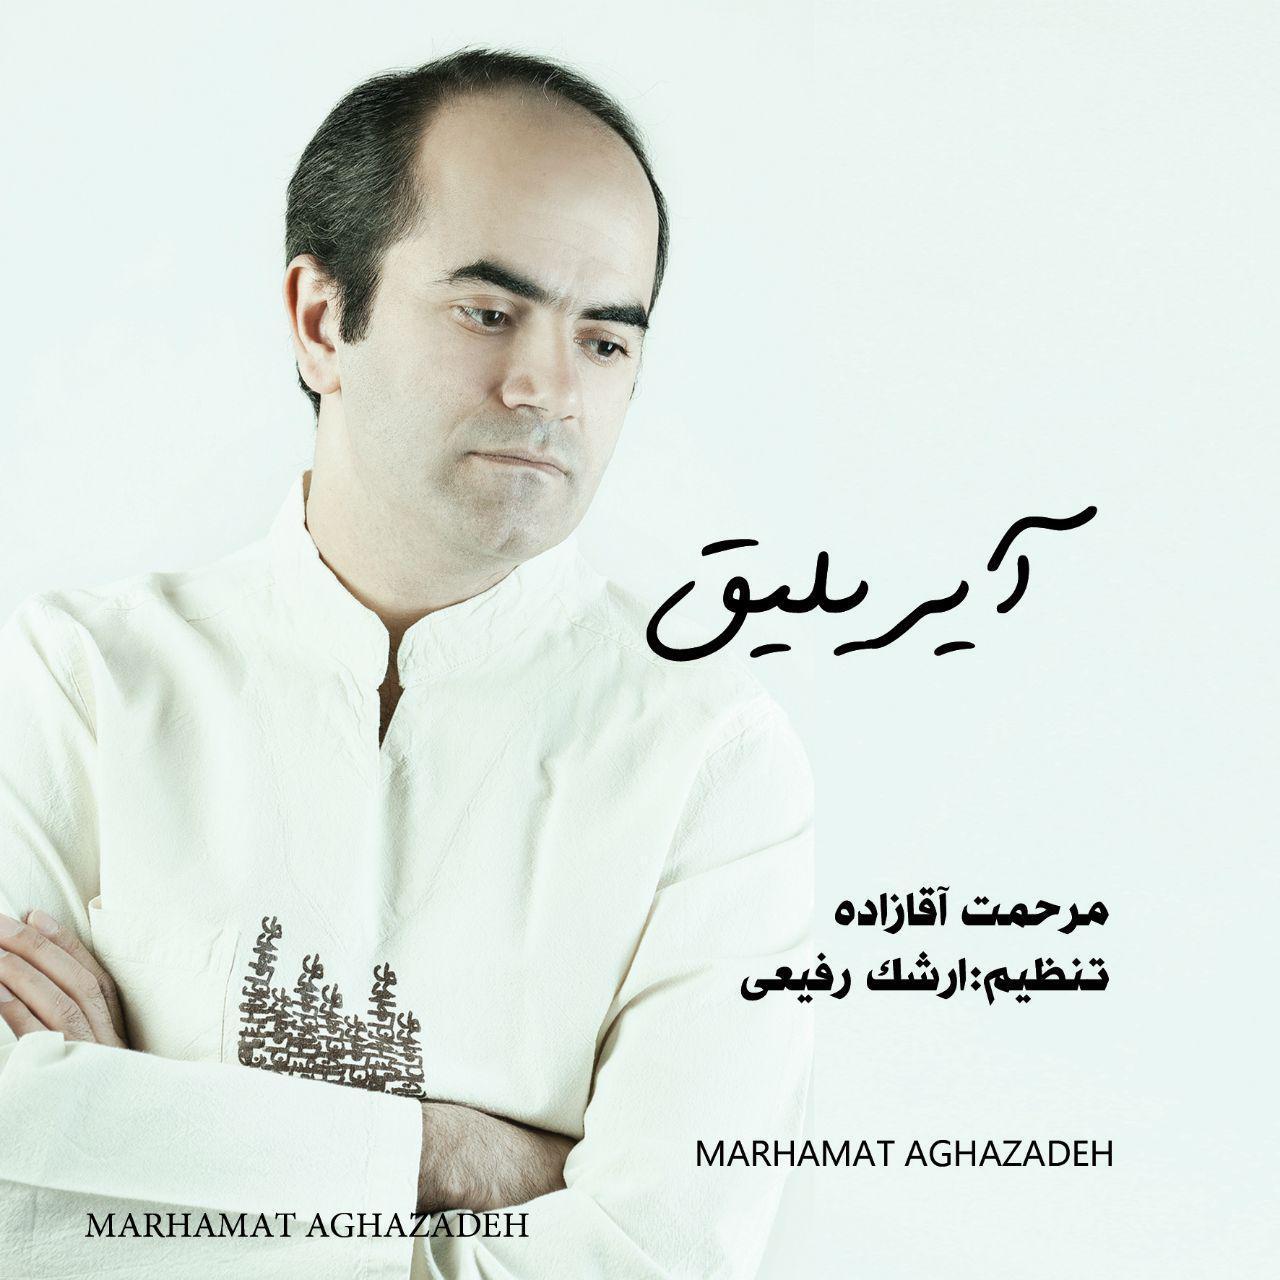 http://s5.picofile.com/file/8369689084/12Marhamat_Aghazadeh_Ayriligh.jpg